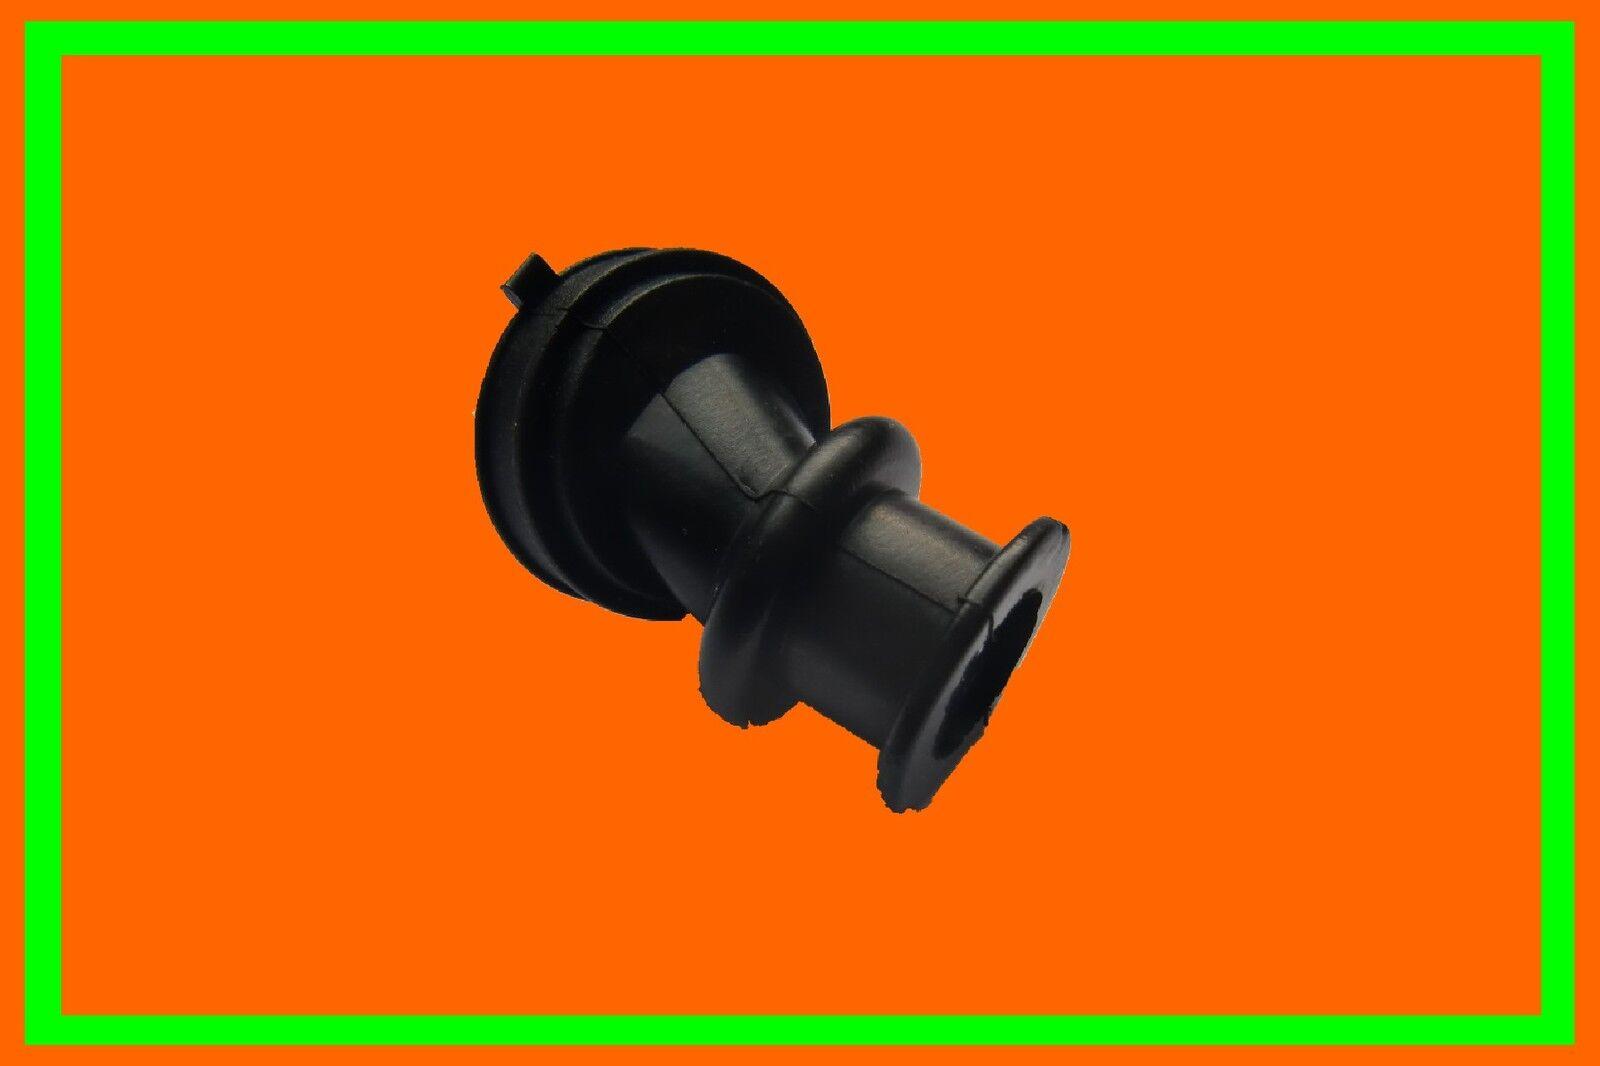 Krümmer Ansaugstutzen für STIHL Motorsäge 024 MS 240